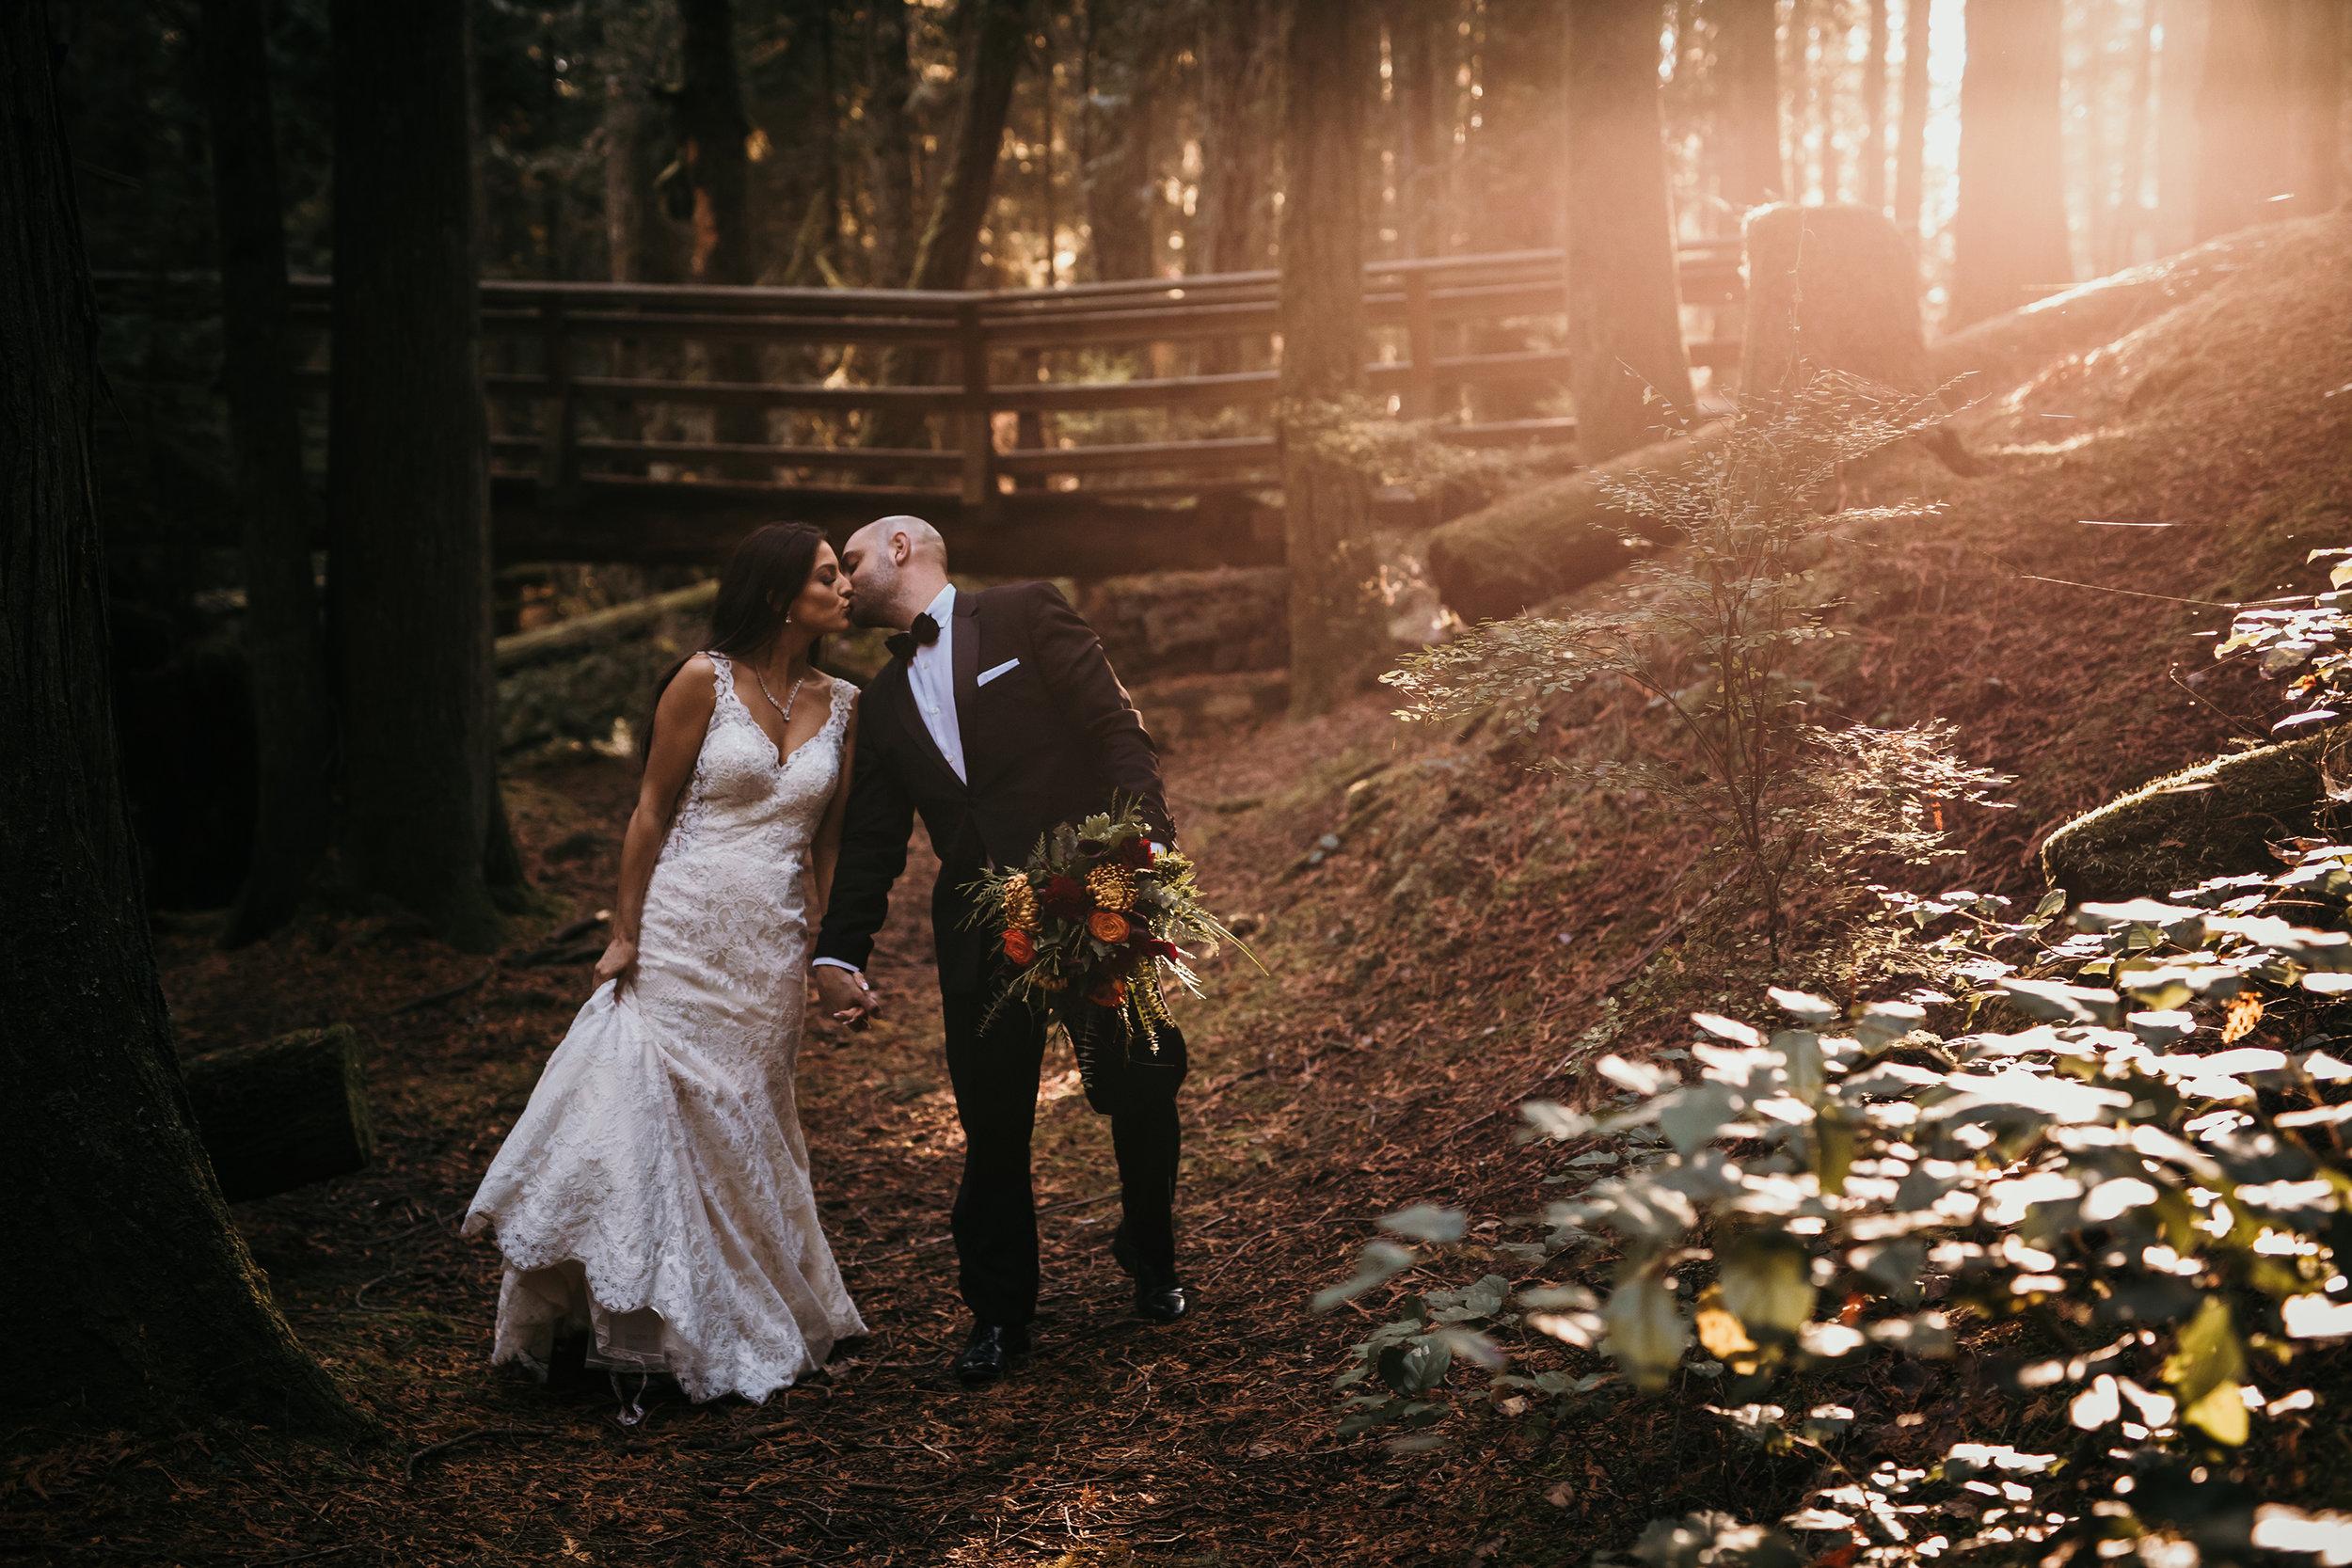 Day After Wedding Photos - Sunshine Coast Wedding Photos - Sunset Wedding Photos - Vancouver Wedding Photographer & Videographer - Sunshine Coast Wedding Photos - Sunshine Coast Wedding Photographer - Jennifer Picard Photography - 1A5A7544.jpg